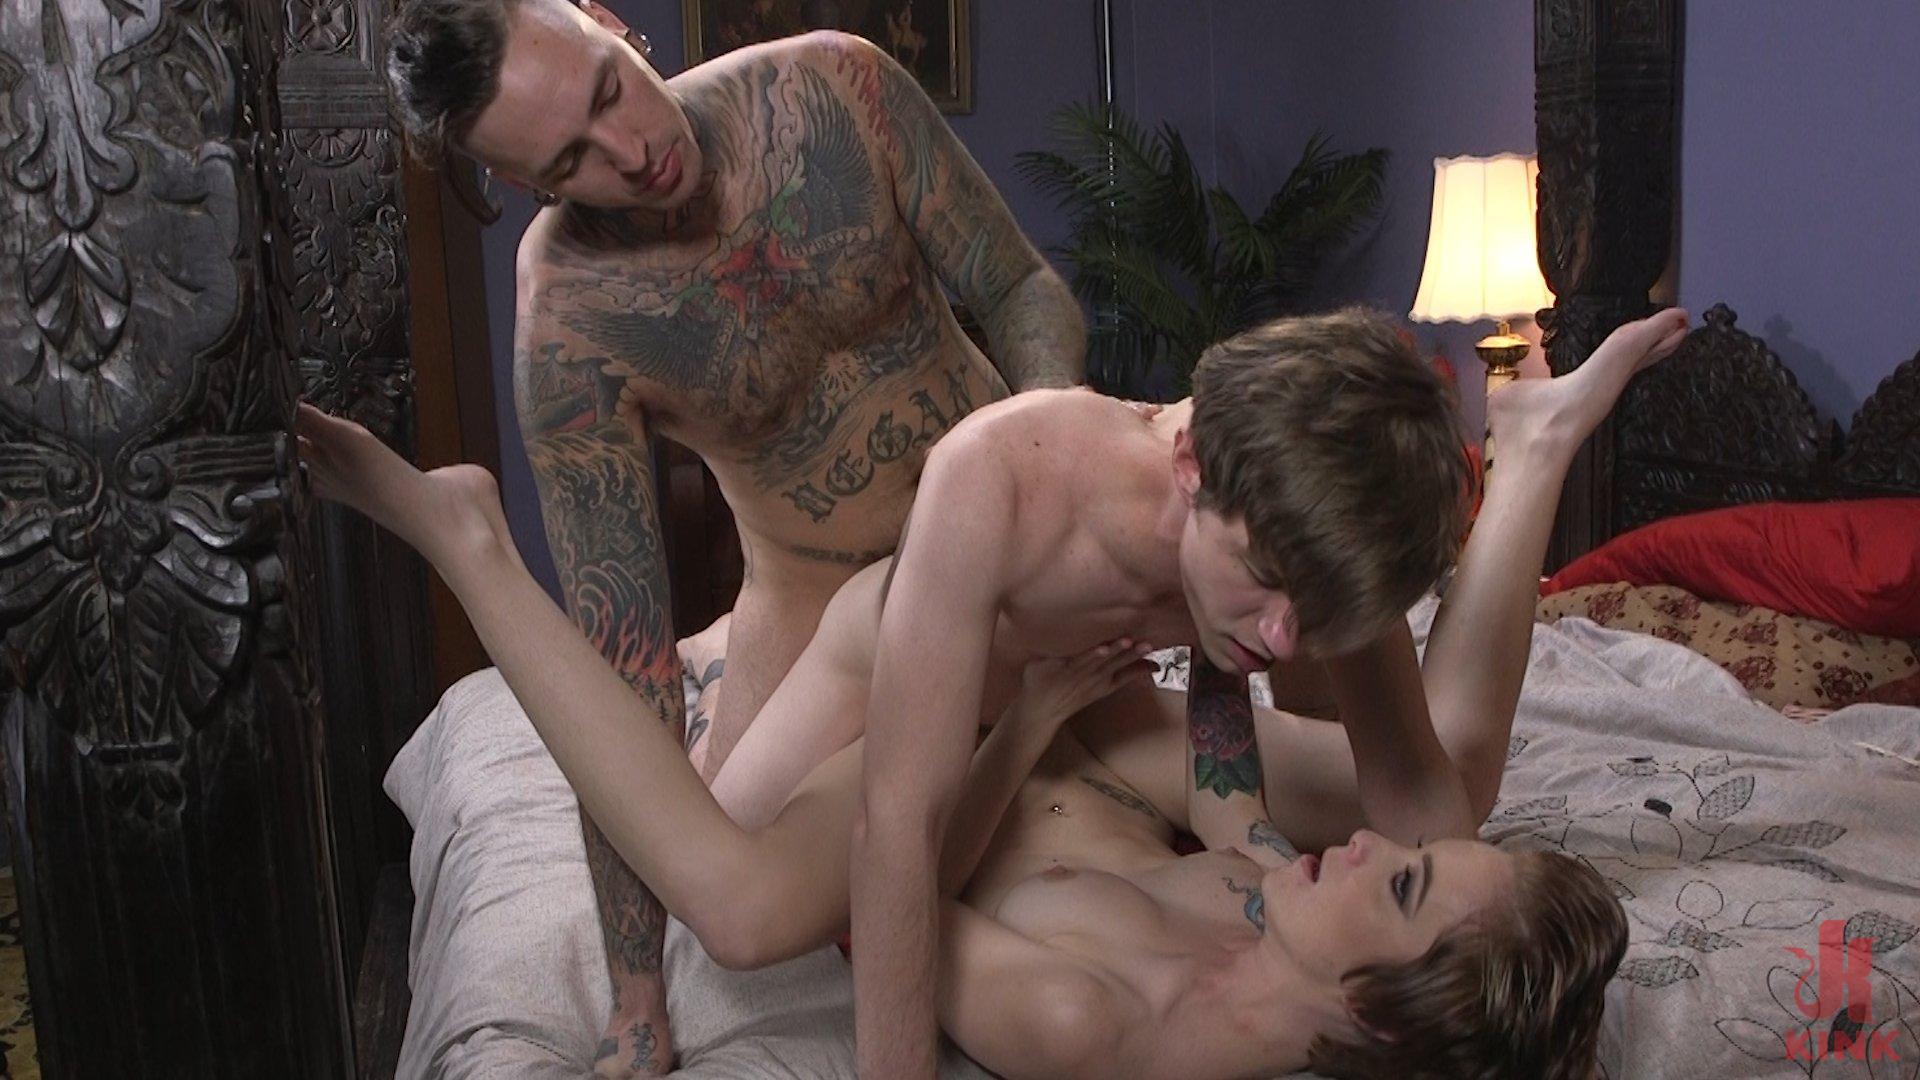 women negotiate threesome